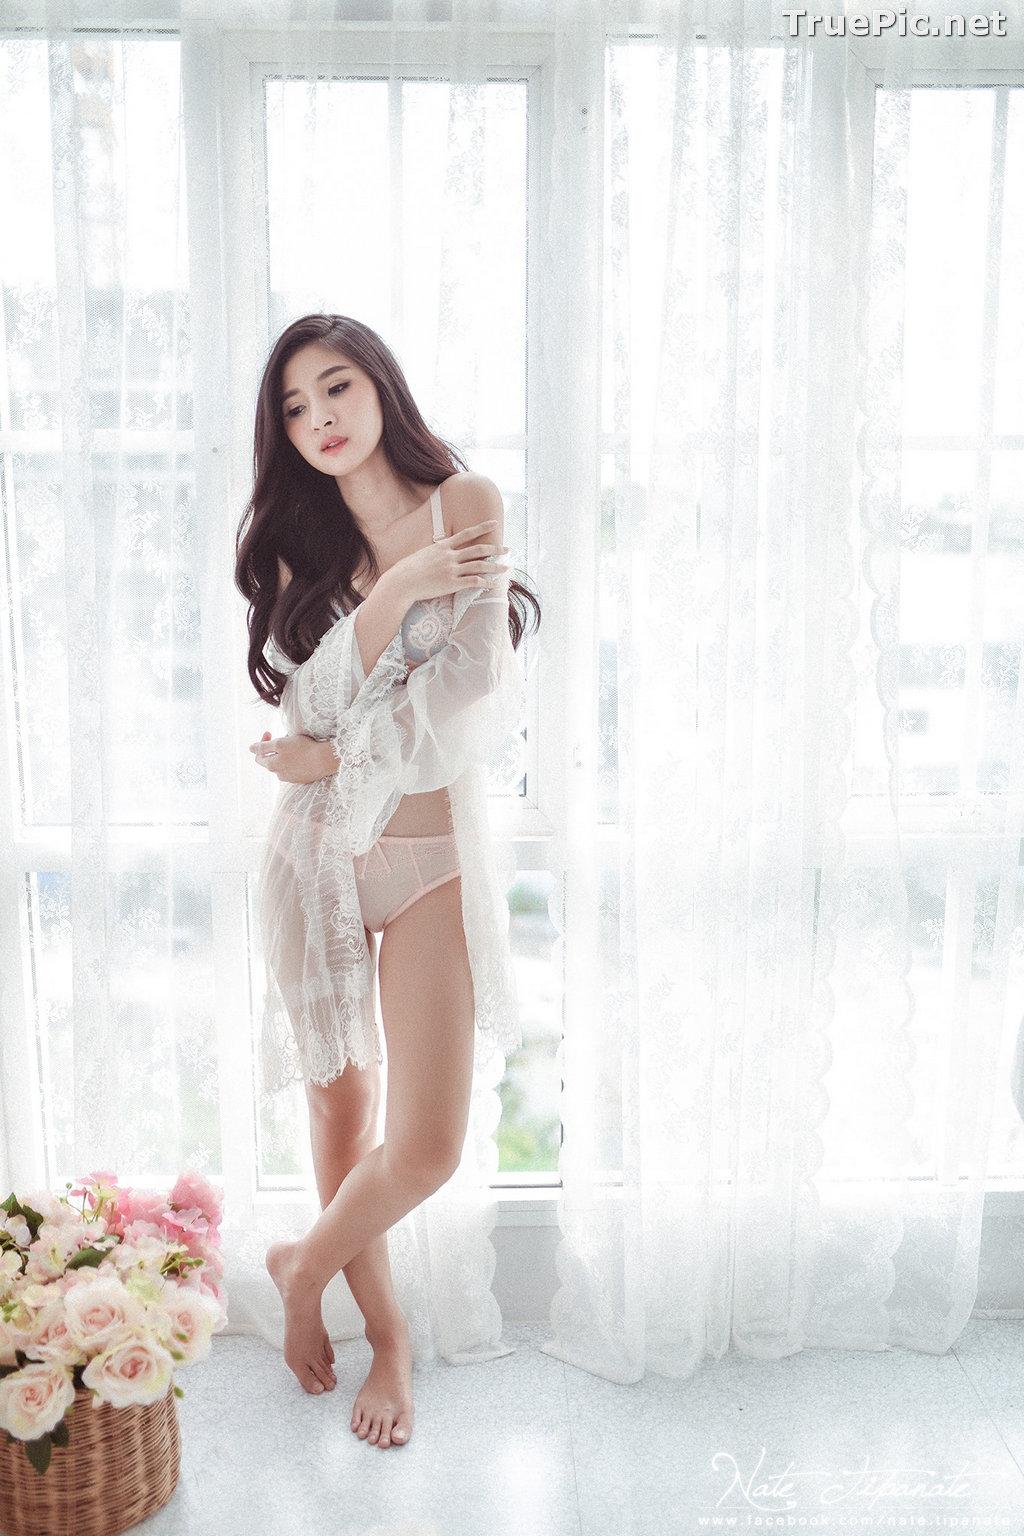 Image Thailand Model - Pattamaporn Keawkum - Sexy Sleepwear and Lingerie - TruePic.net - Picture-8